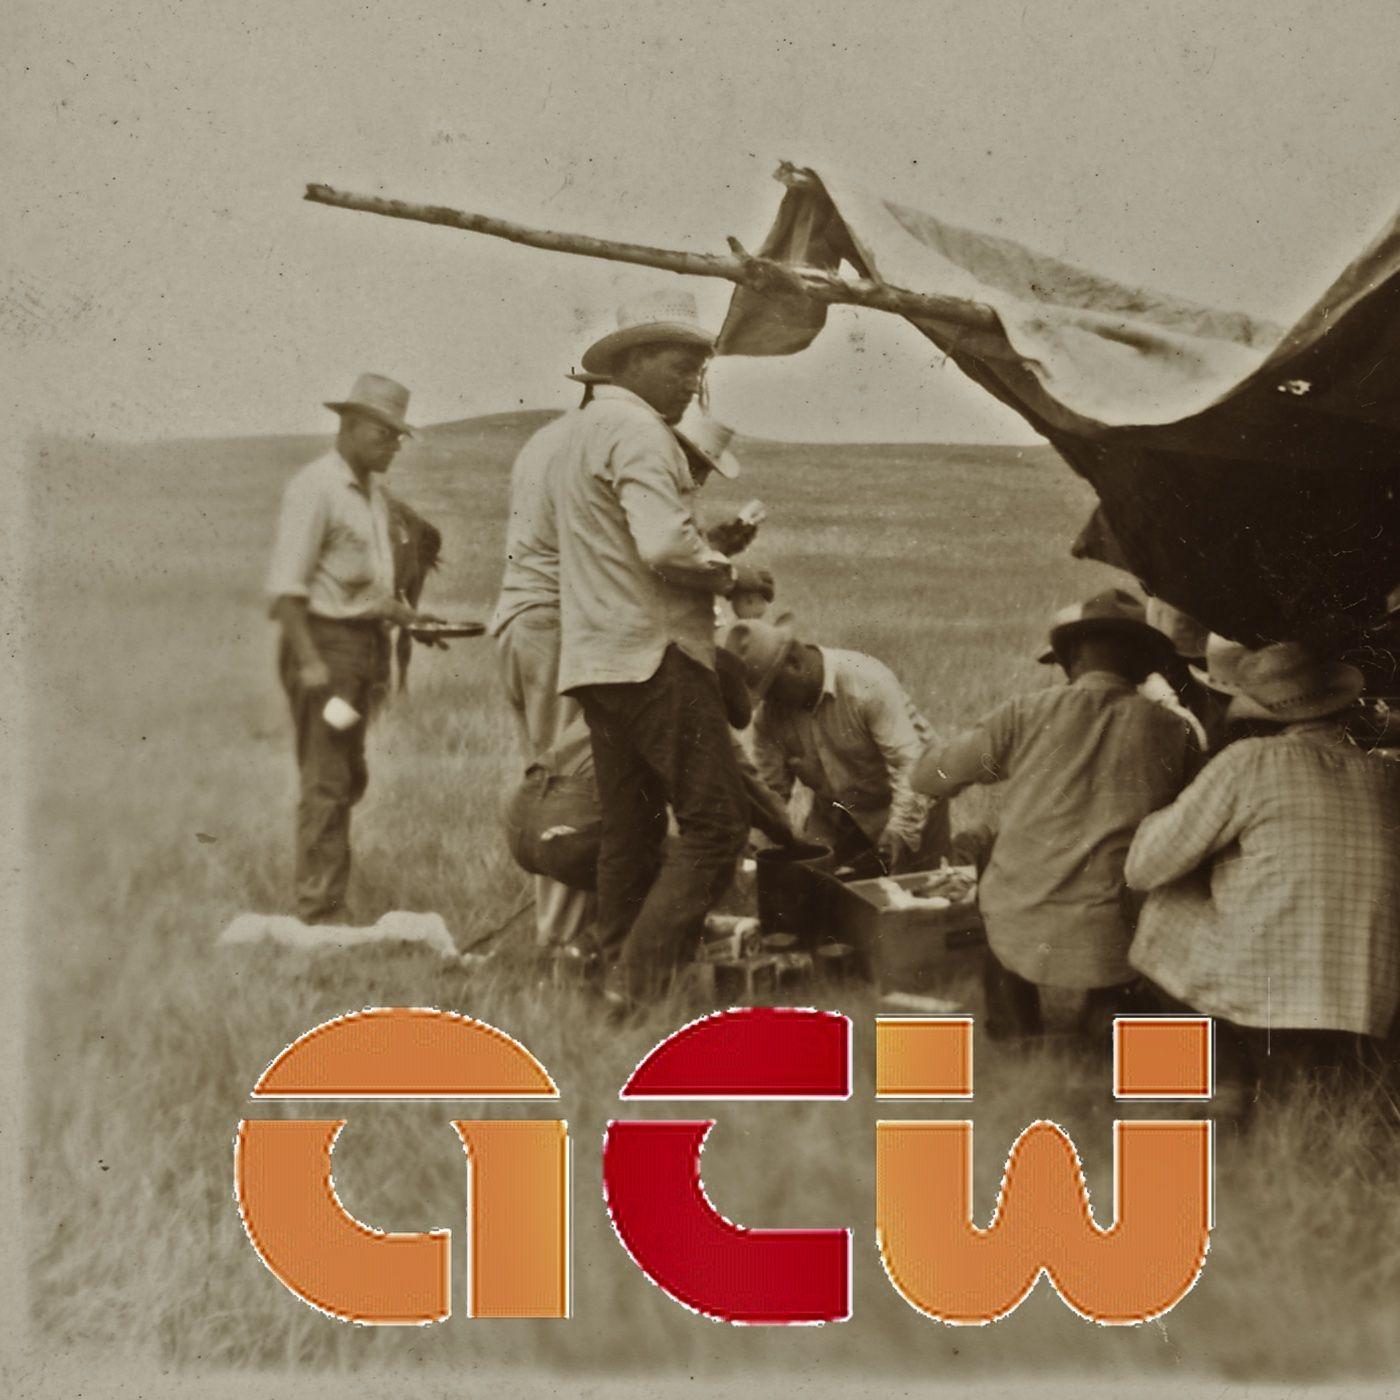 Listen to Agile Chuck Wagon episodes free, on demand. Each